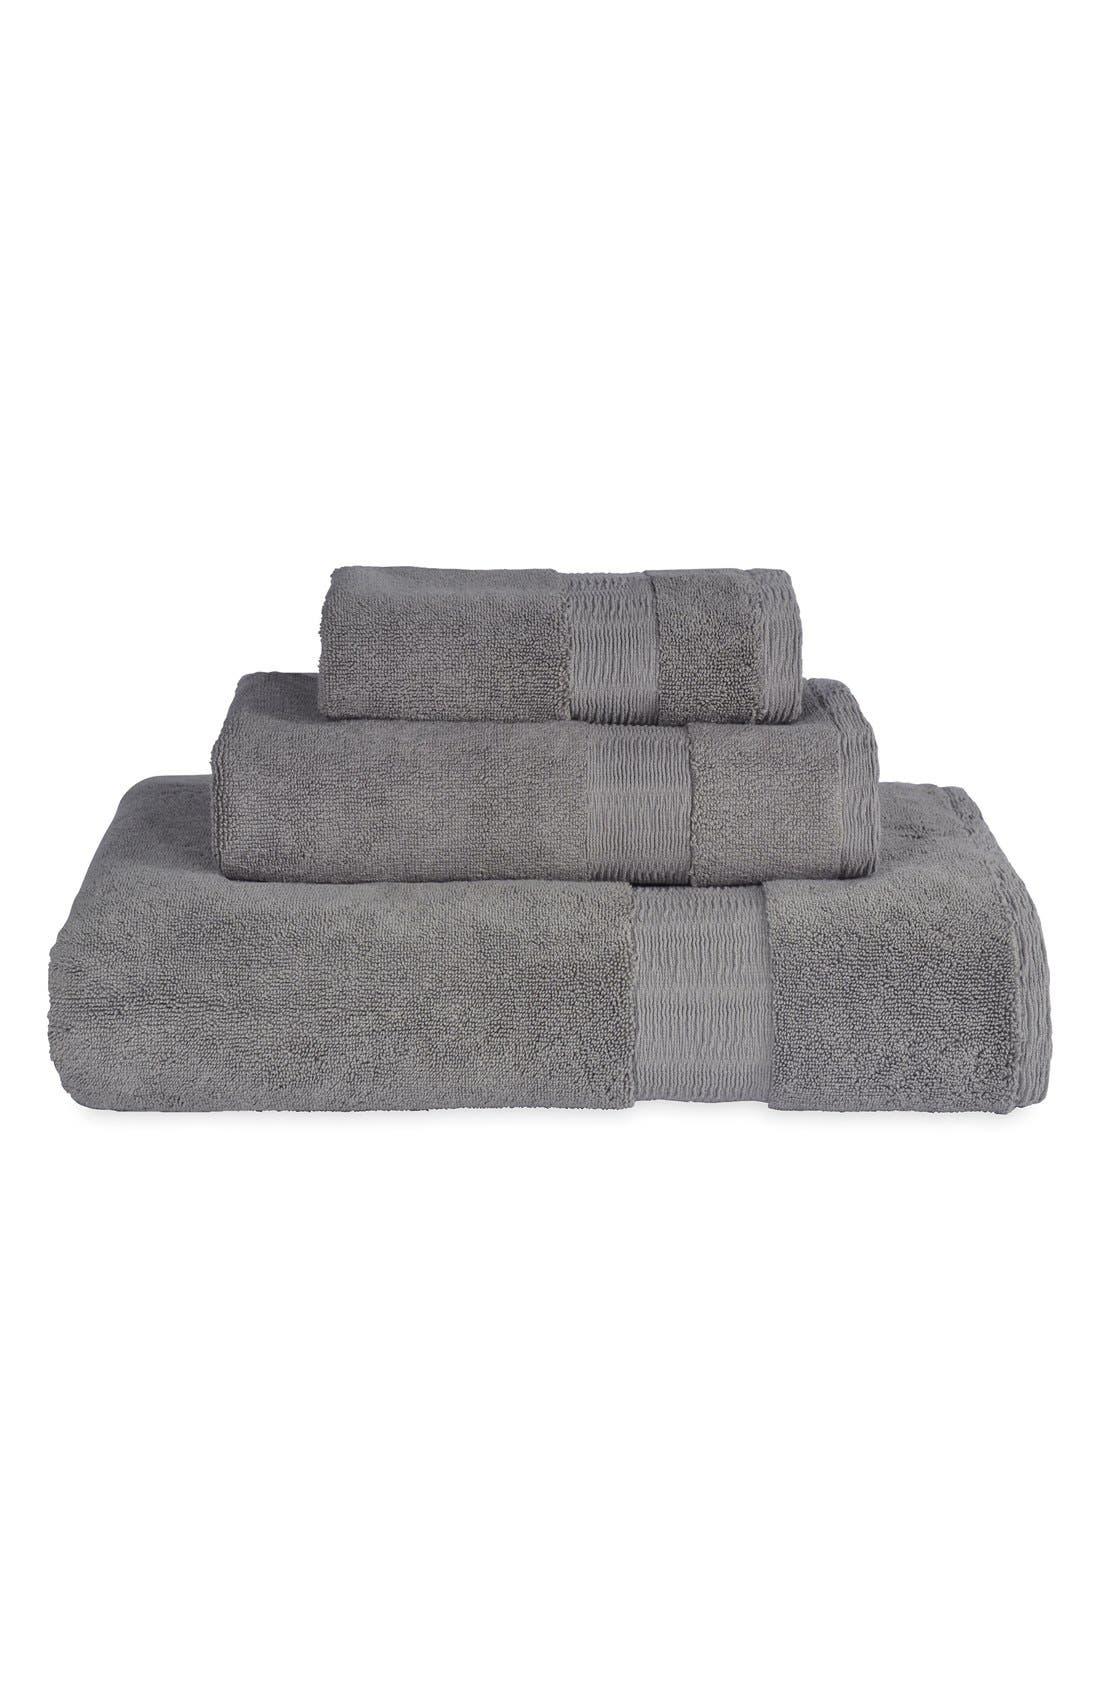 Mercer Wash Towel,                             Alternate thumbnail 2, color,                             Grey